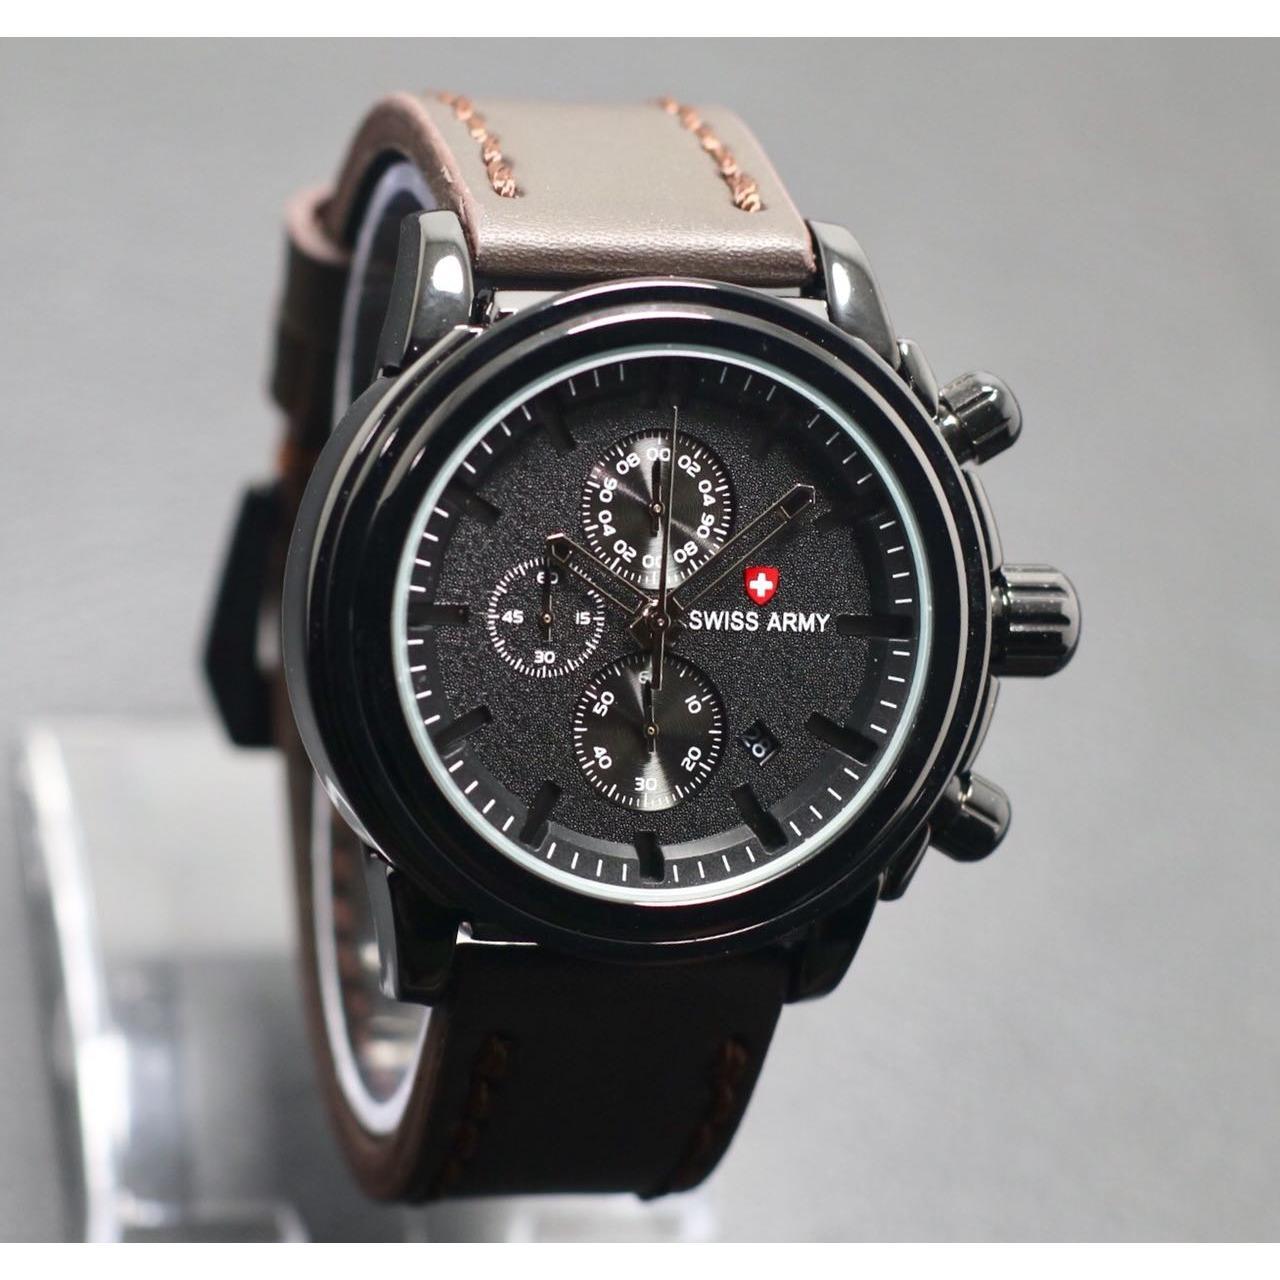 Jam tangan pria - Model Casual - SA 7739 BJ - SWISS ARMY - crono aktif